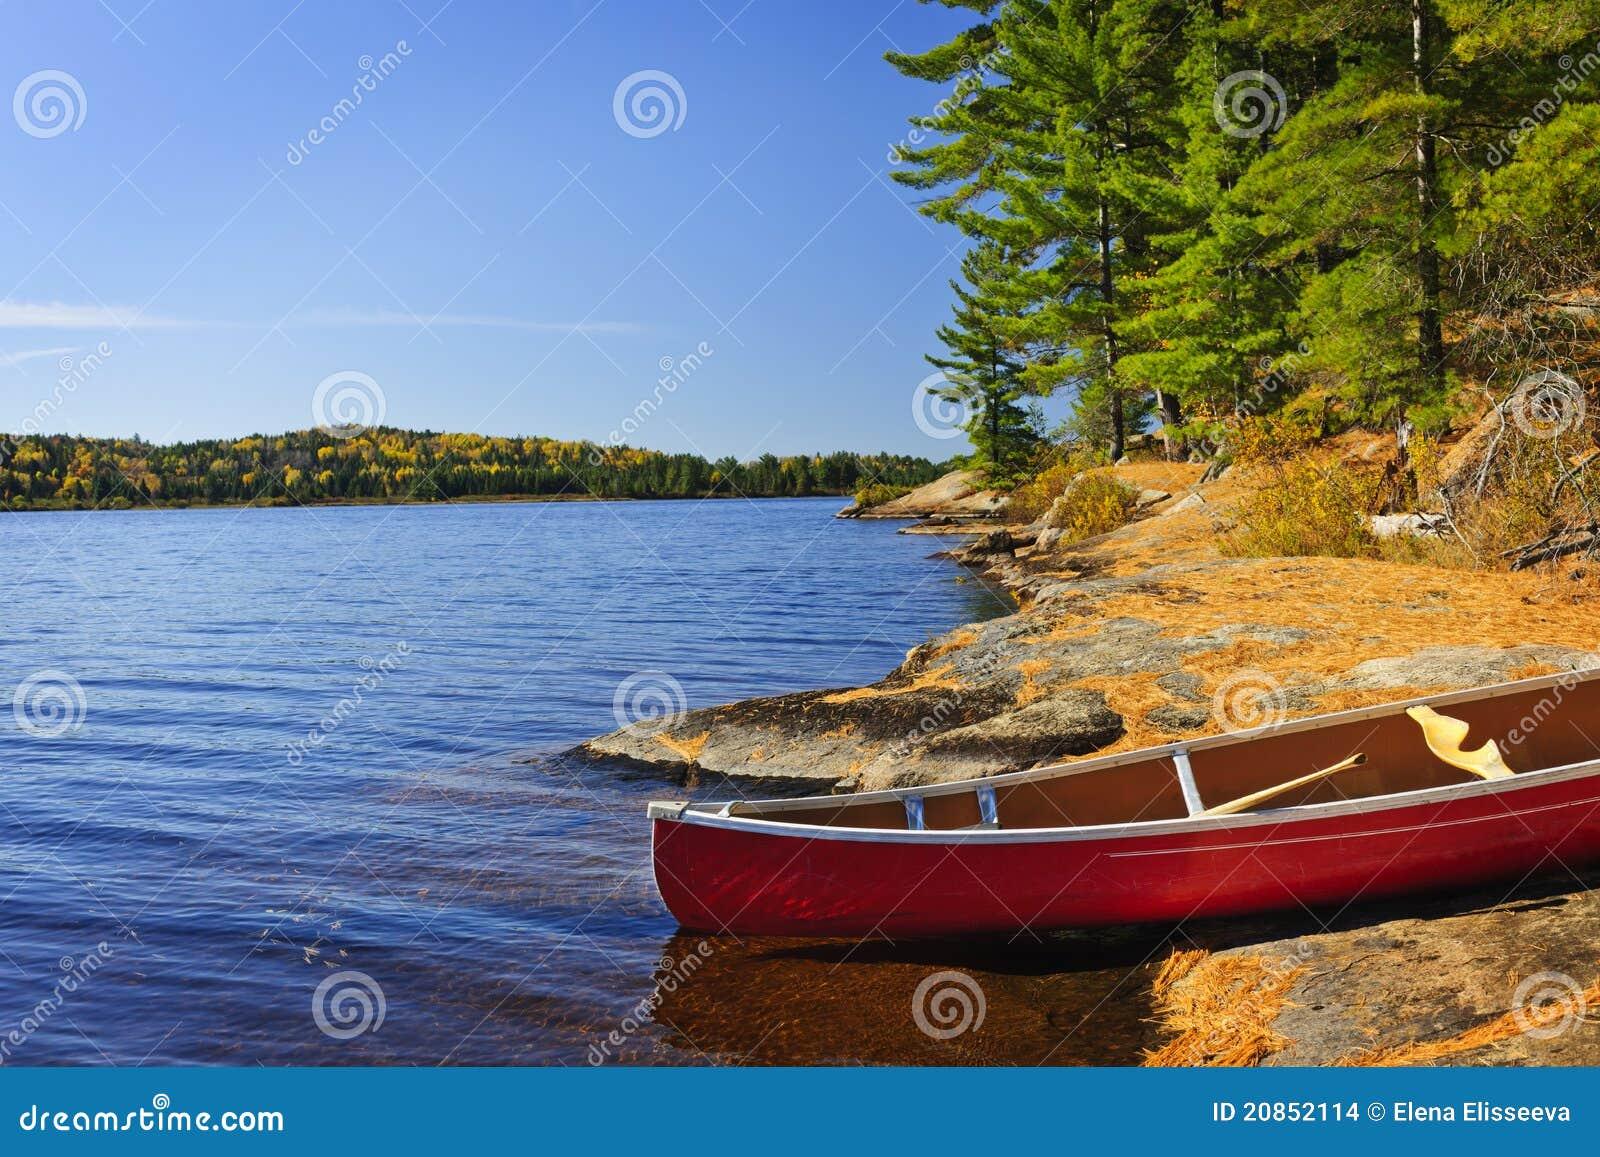 Kanu auf Ufer